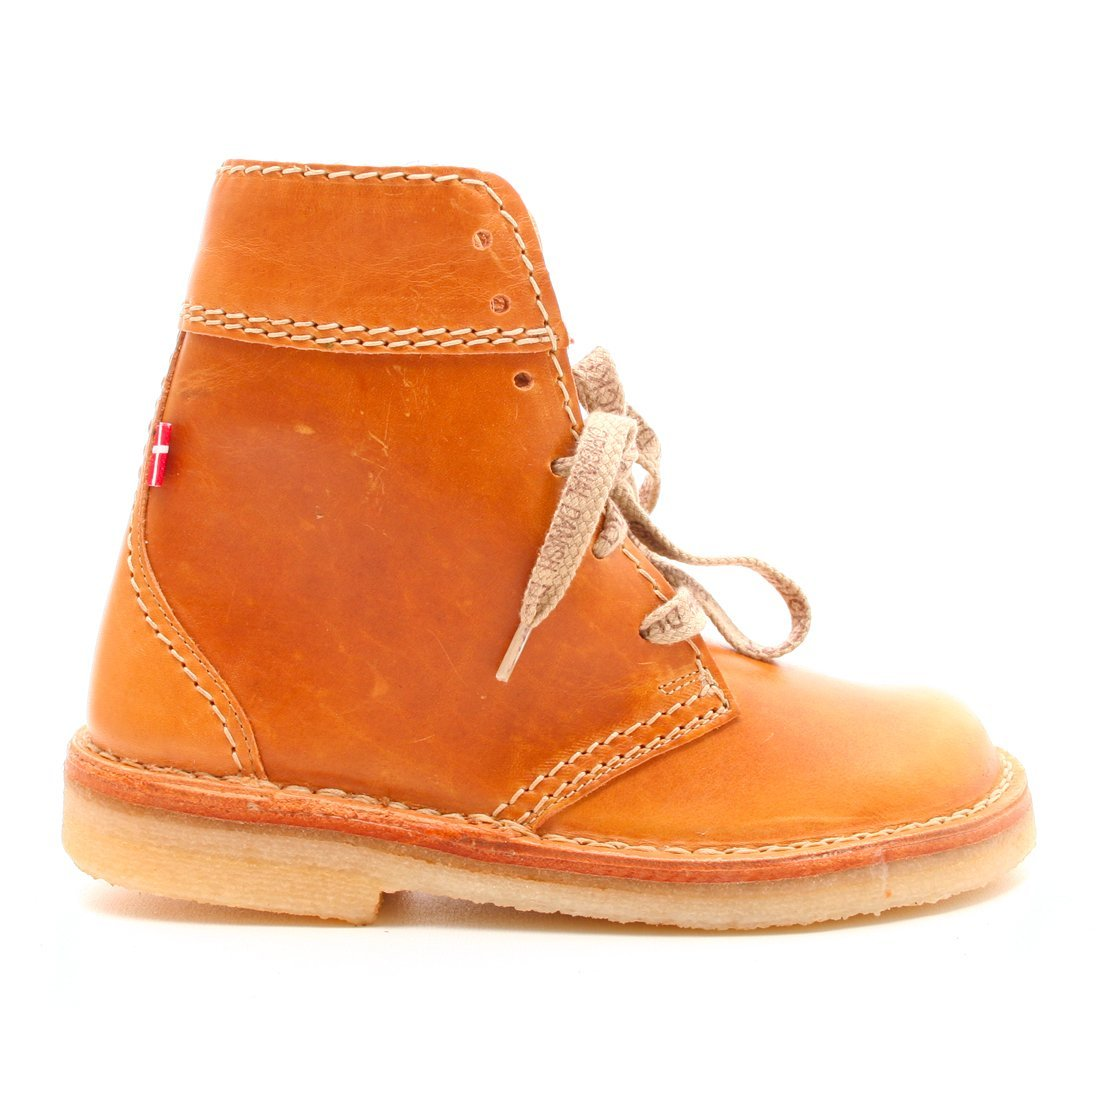 Duckfeet Faborg Boot B0054ICTUM 7 D(M) US Brown